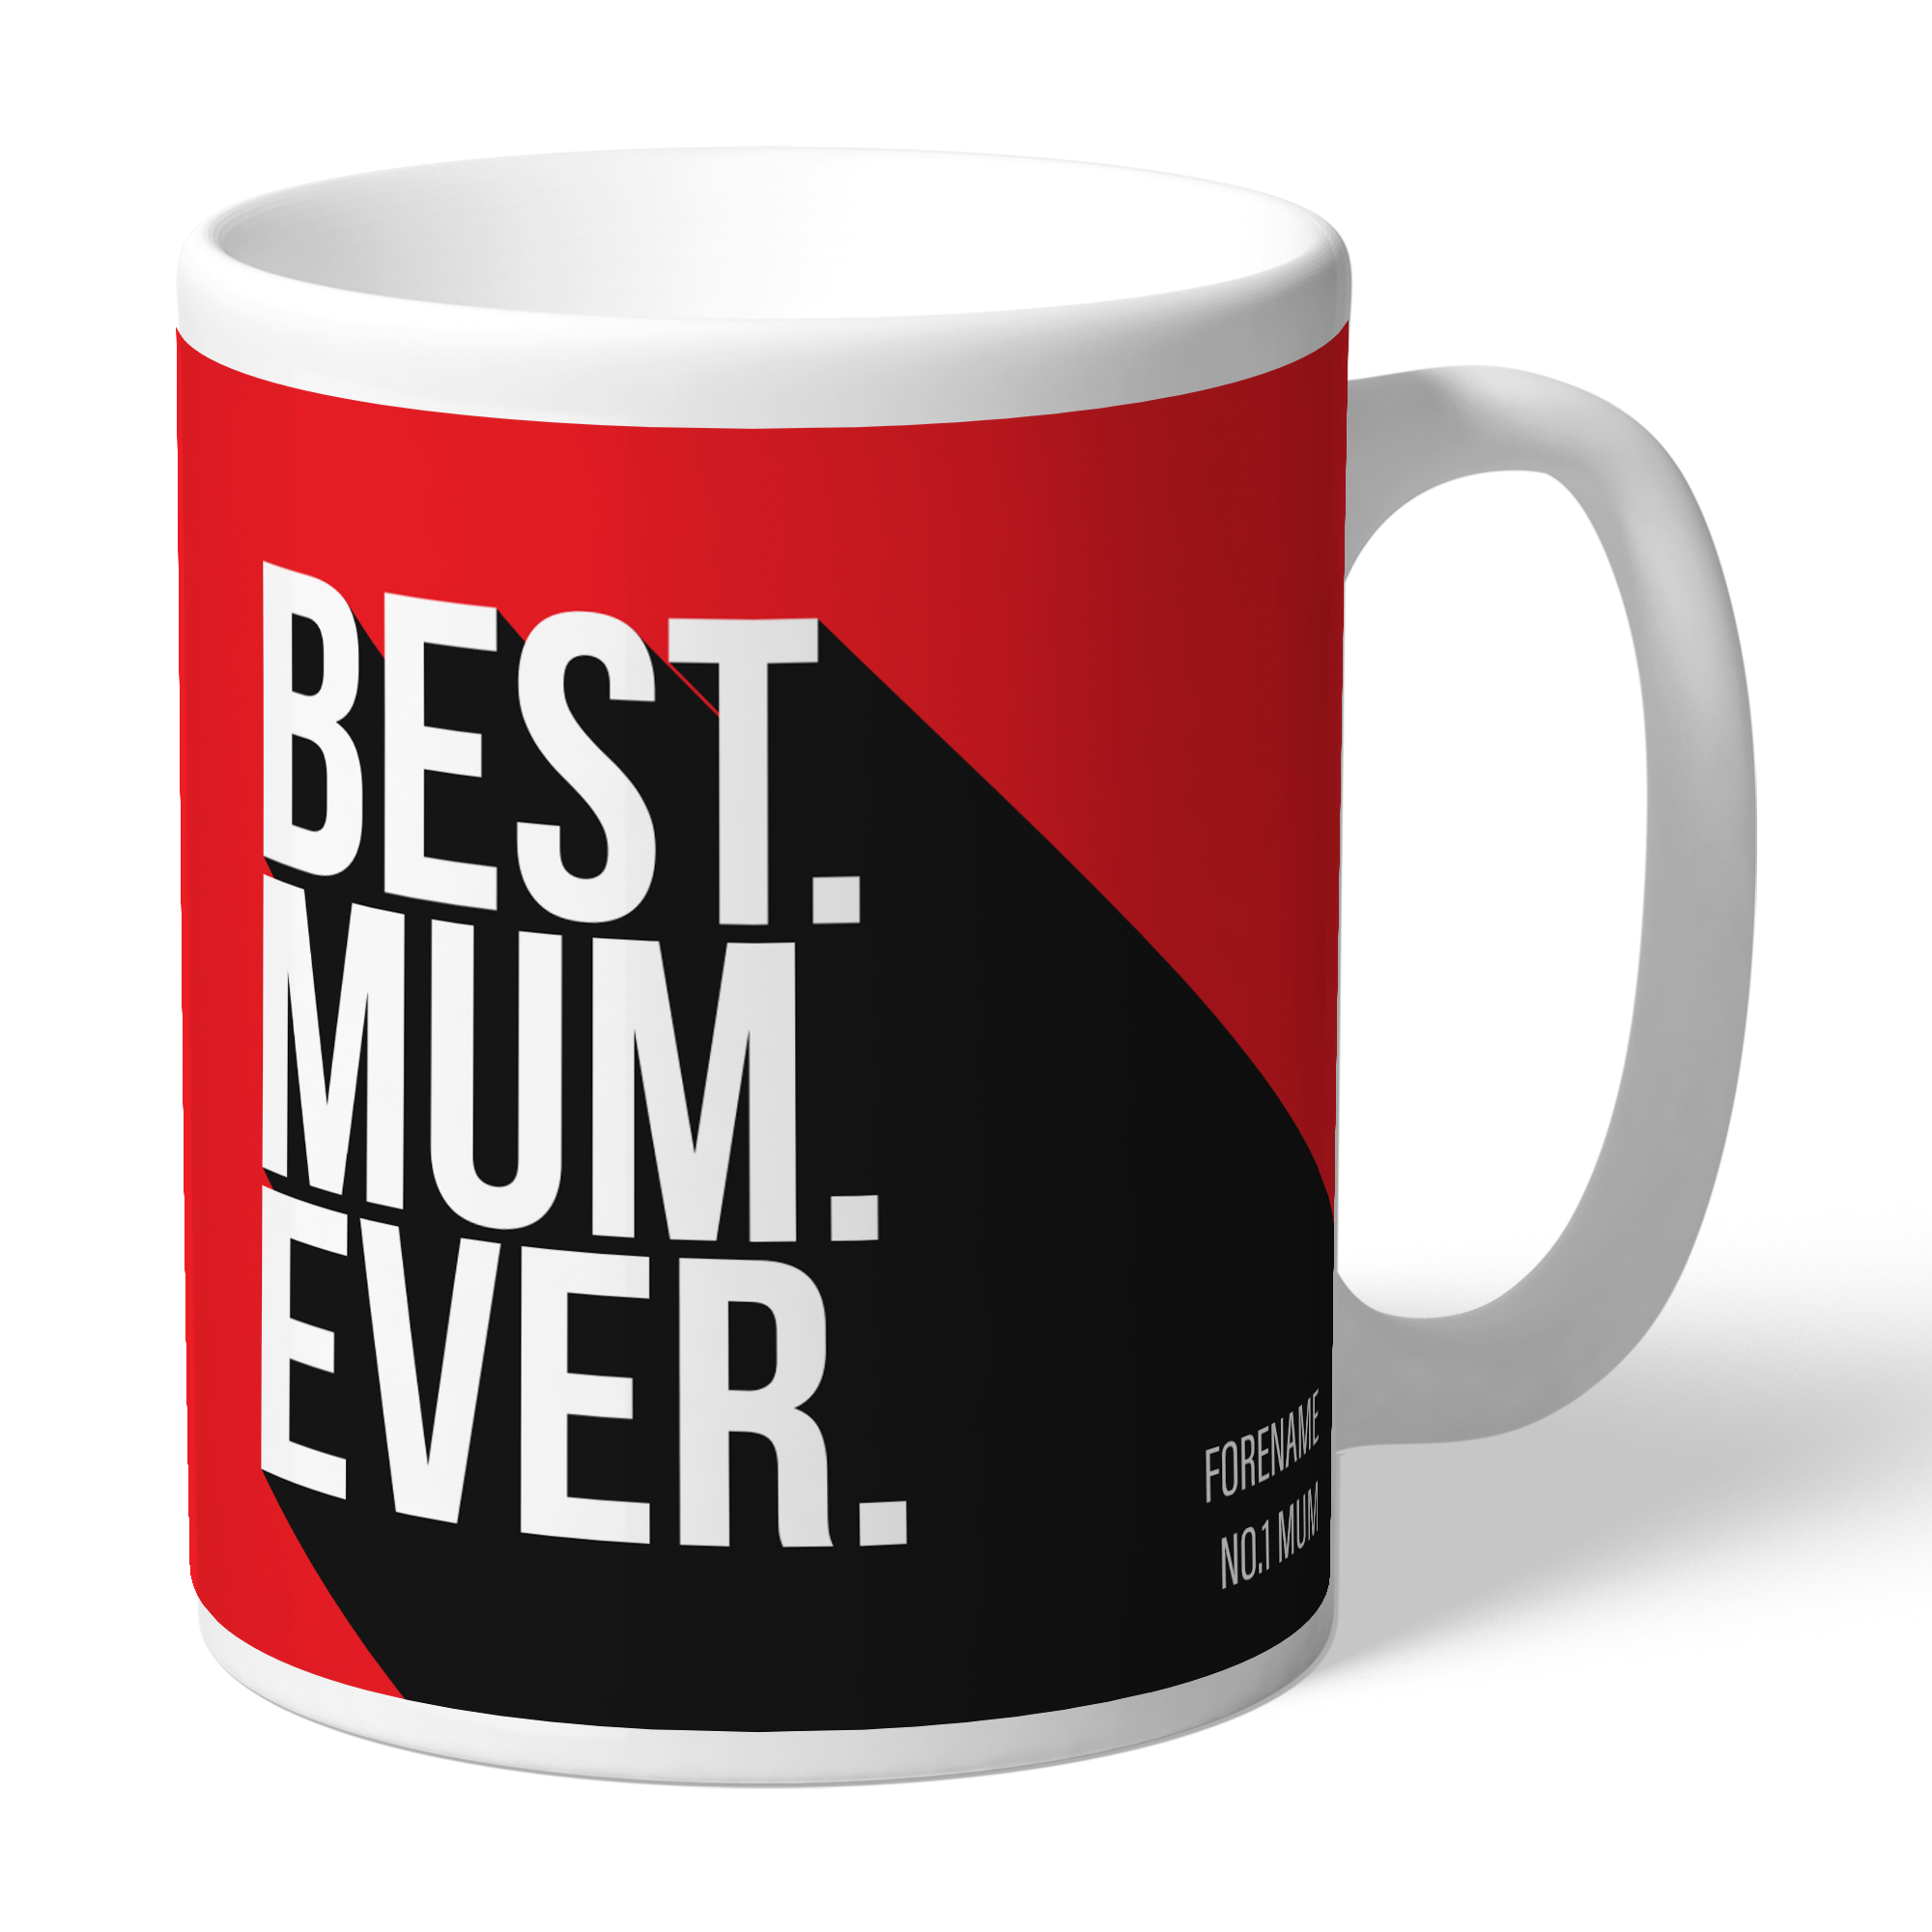 Sheffield United Best Mum Ever Mug